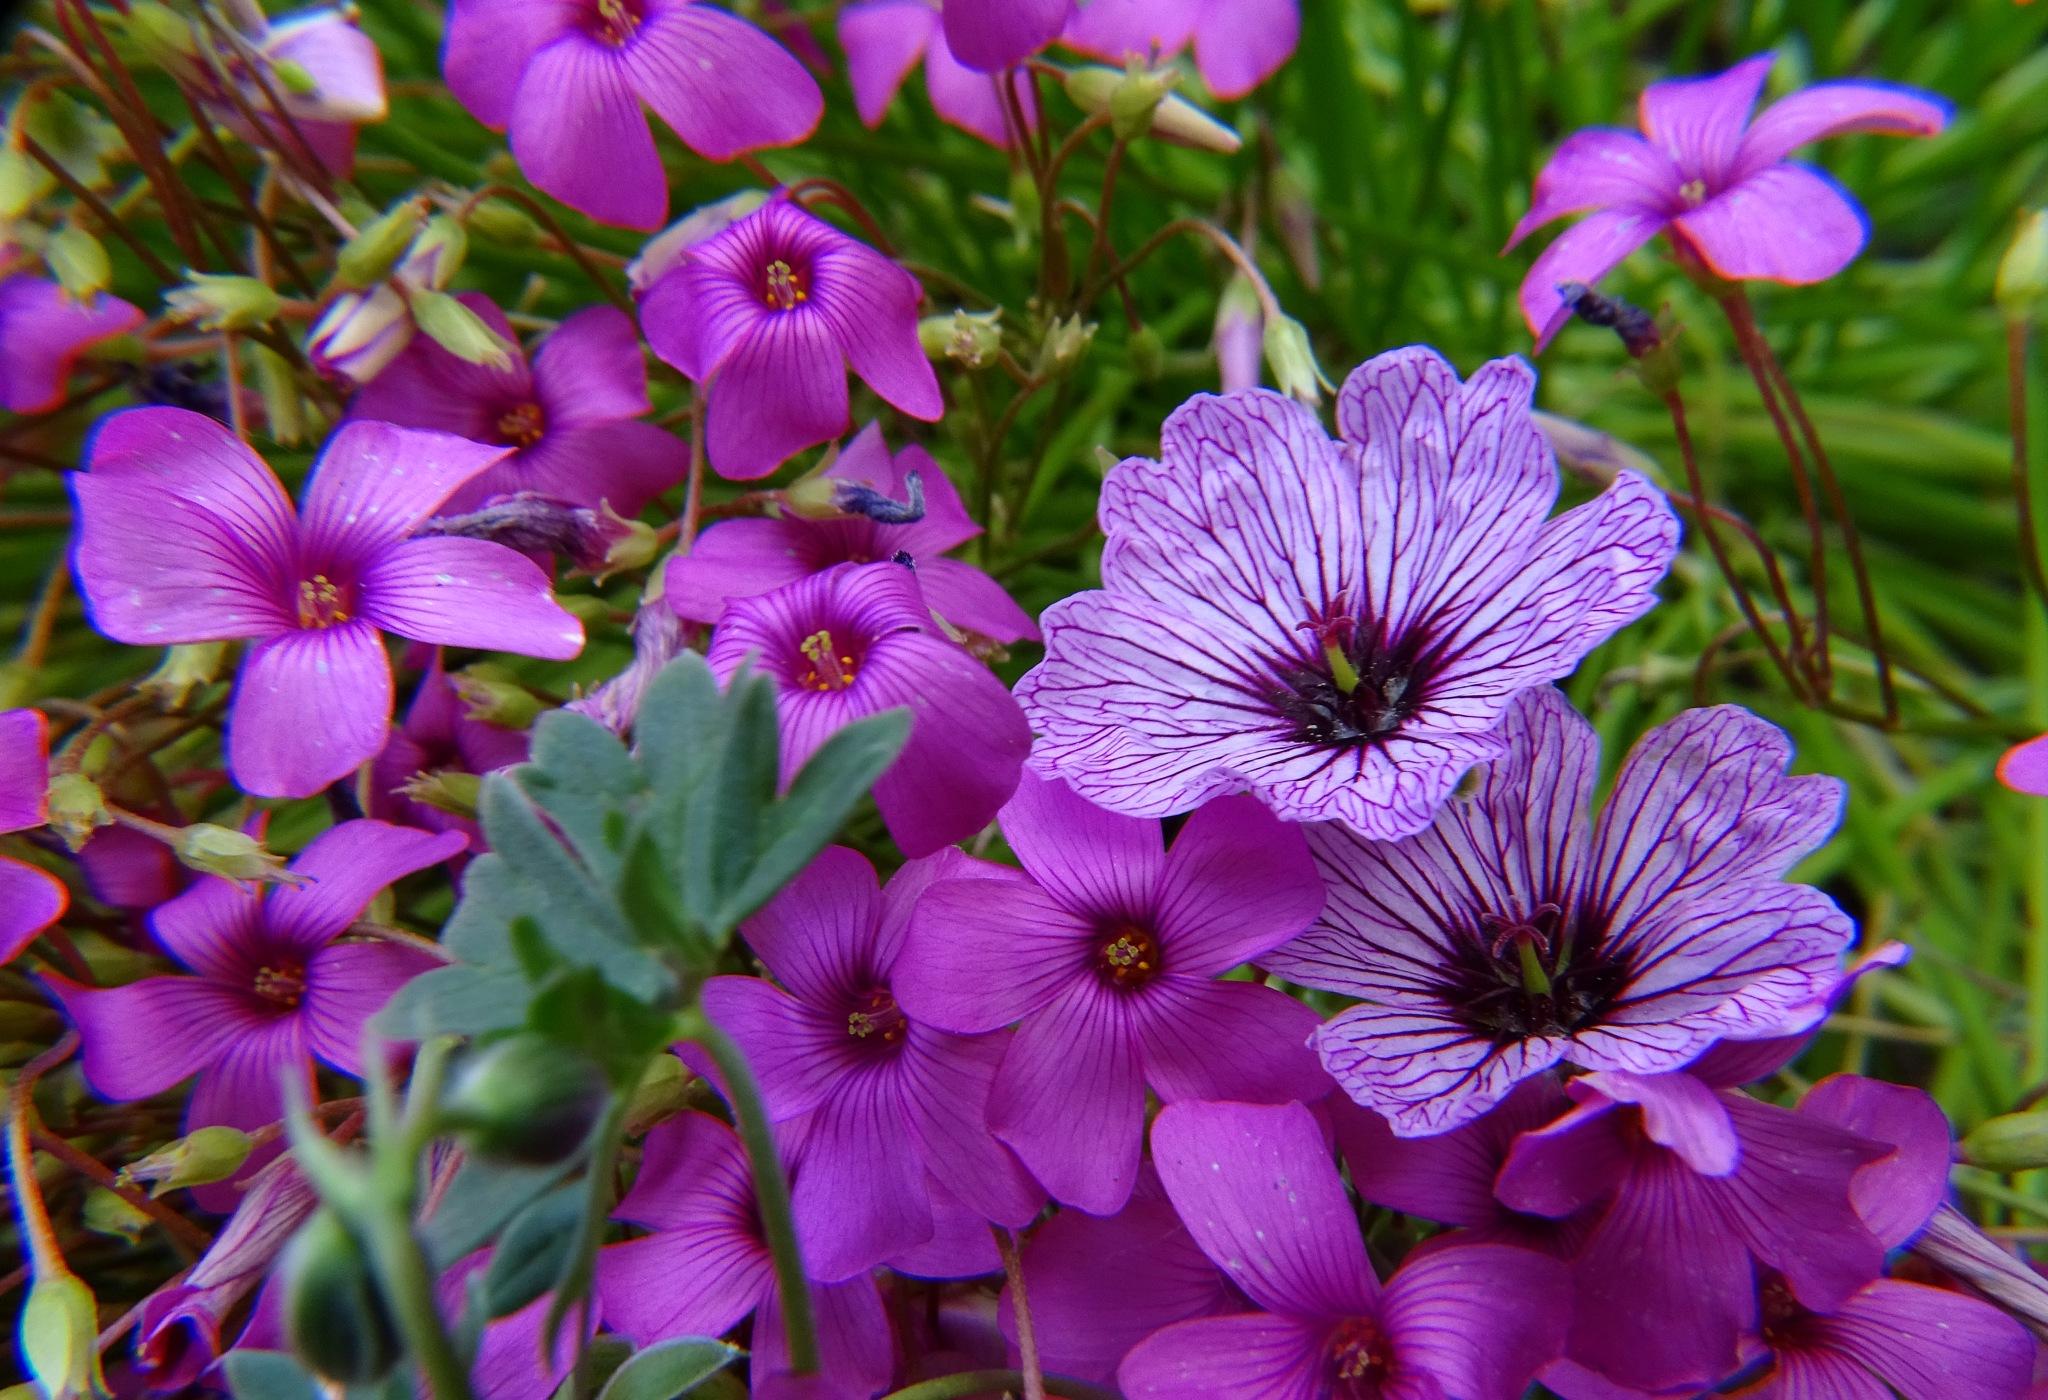 Geranium and Oxalis. by kayThornton